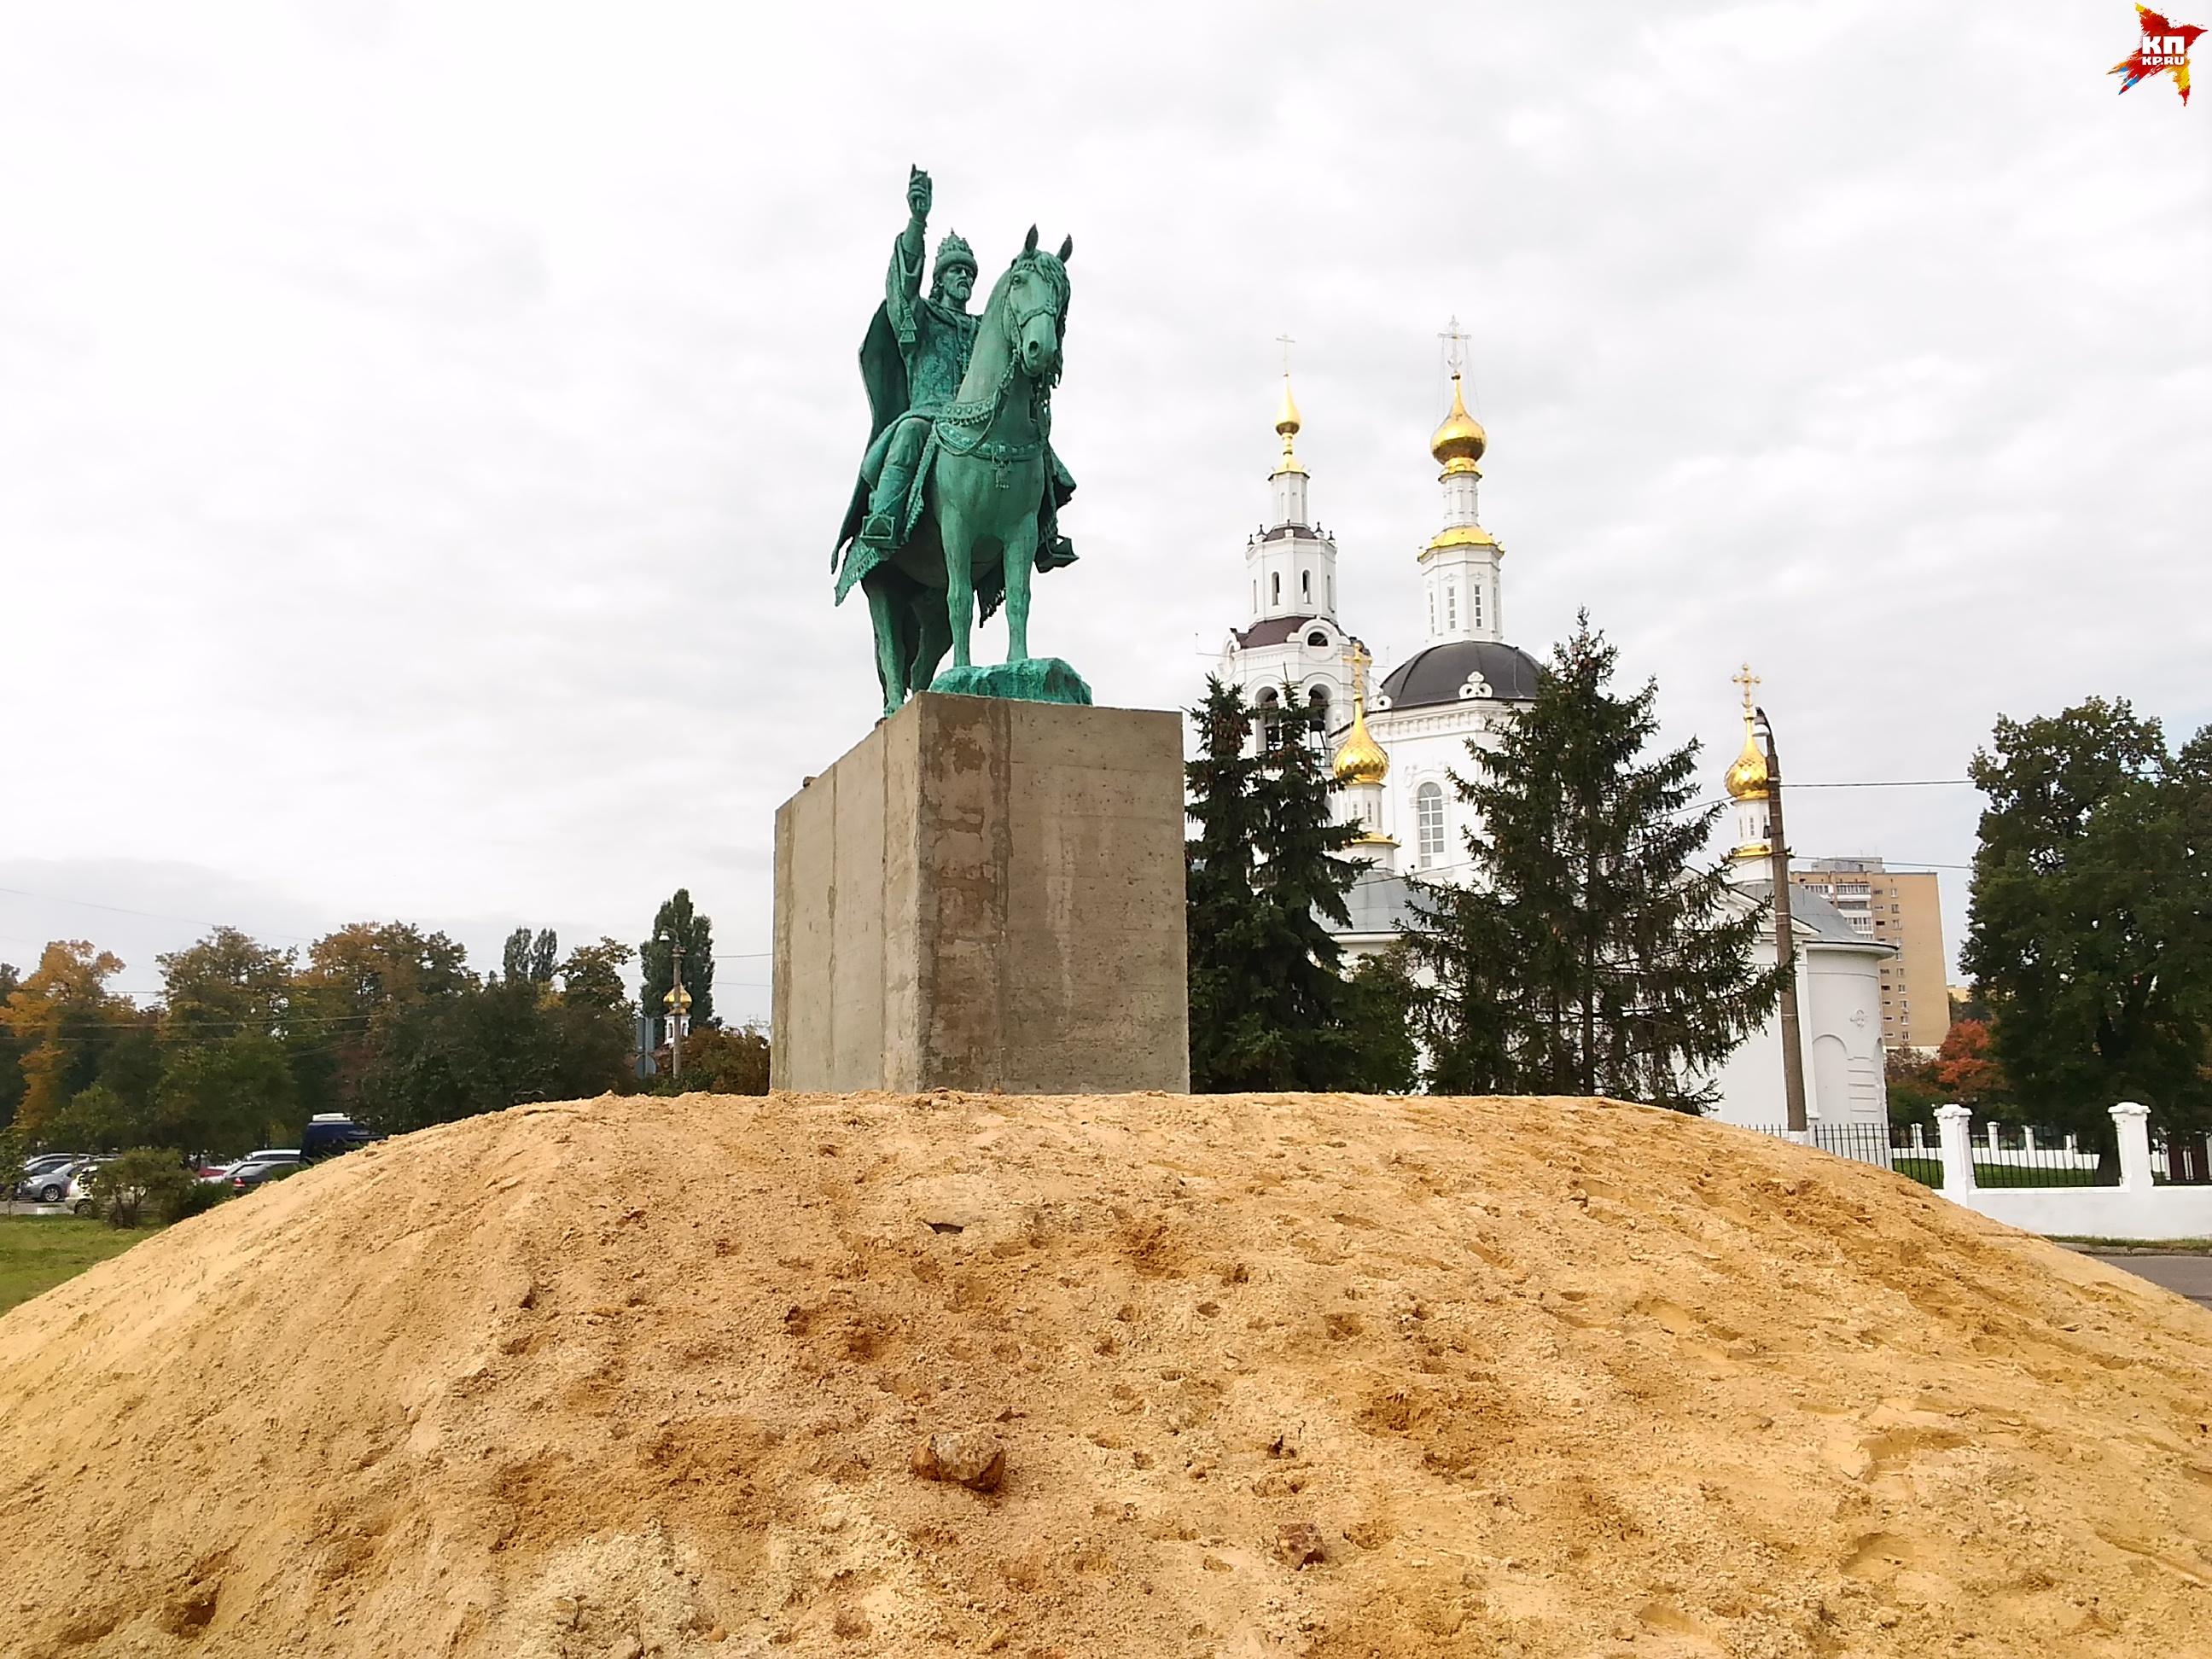 ВОрле установили памятник Ивану Грозному